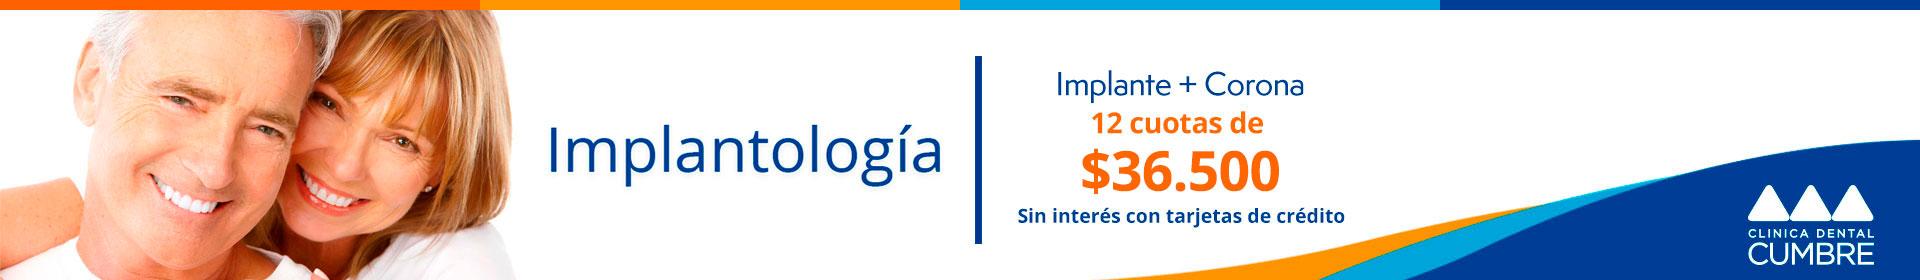 interna-implantologia-2